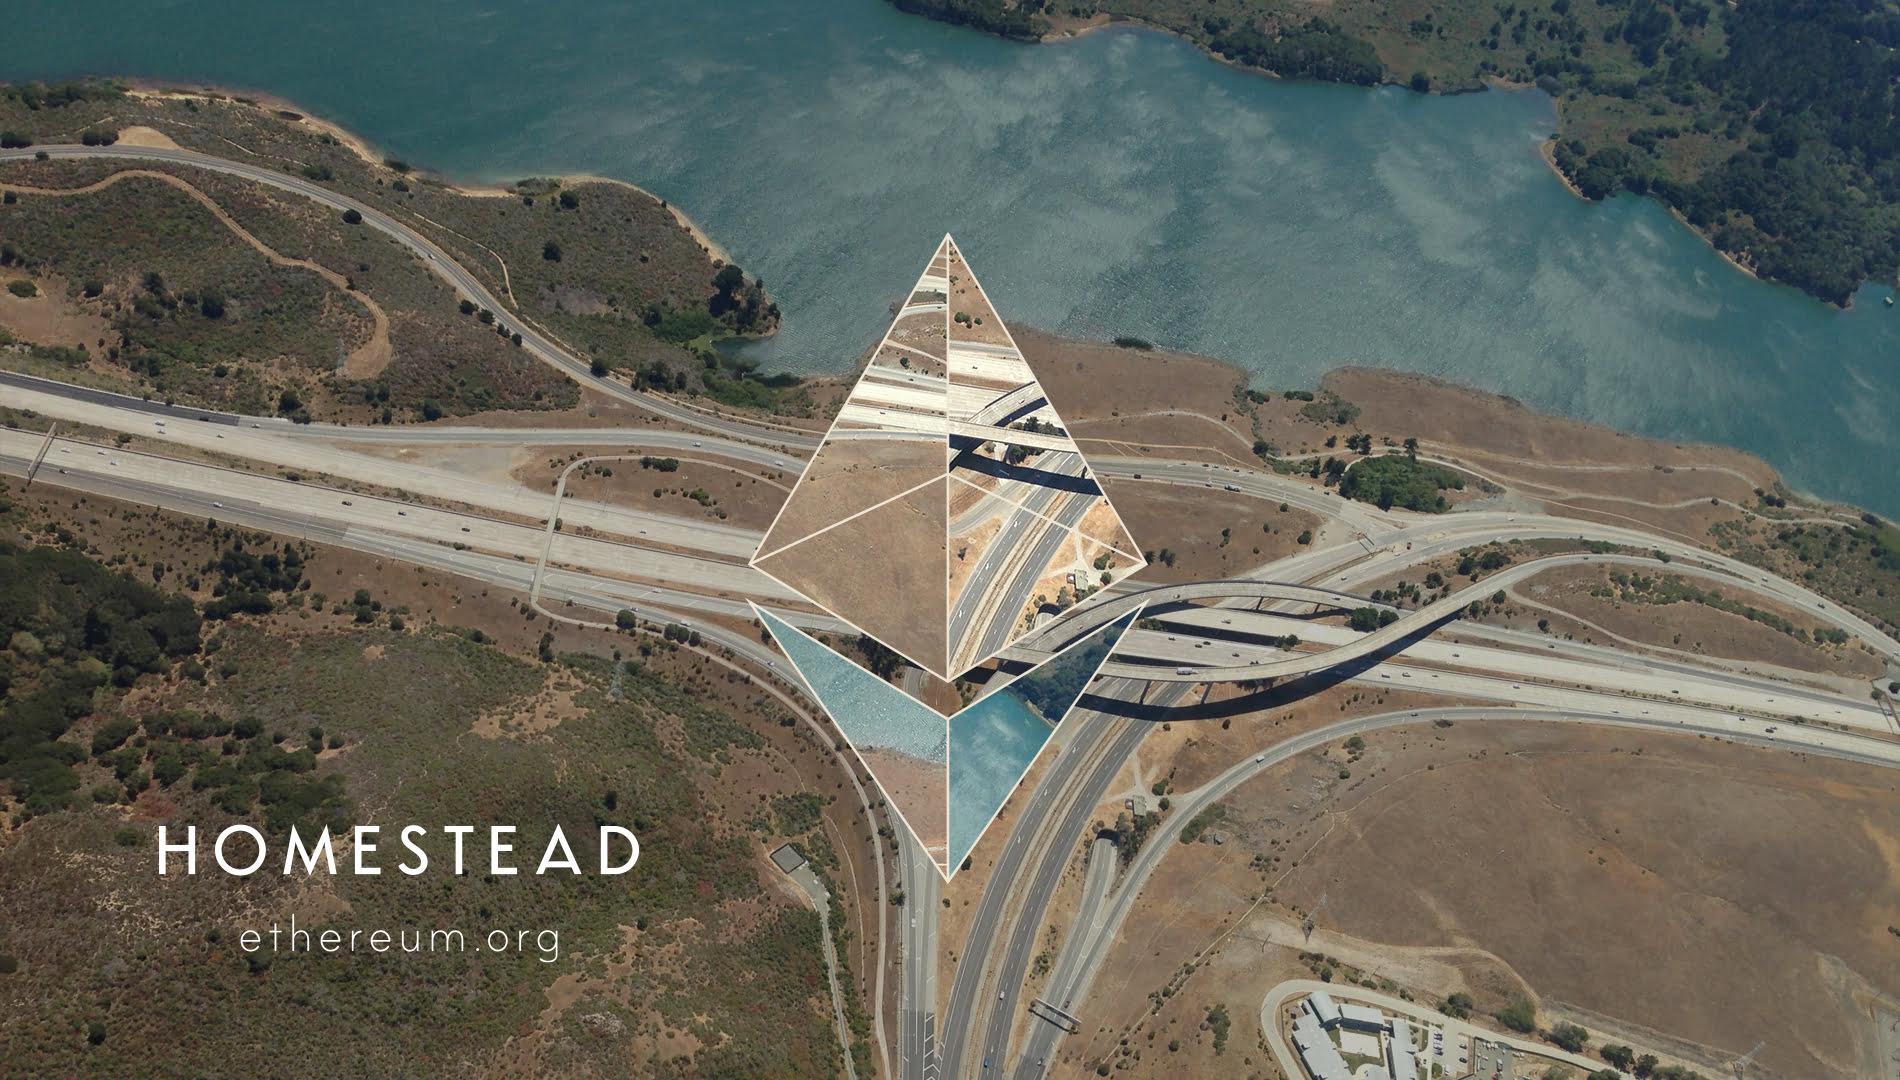 Ethereum homestead background